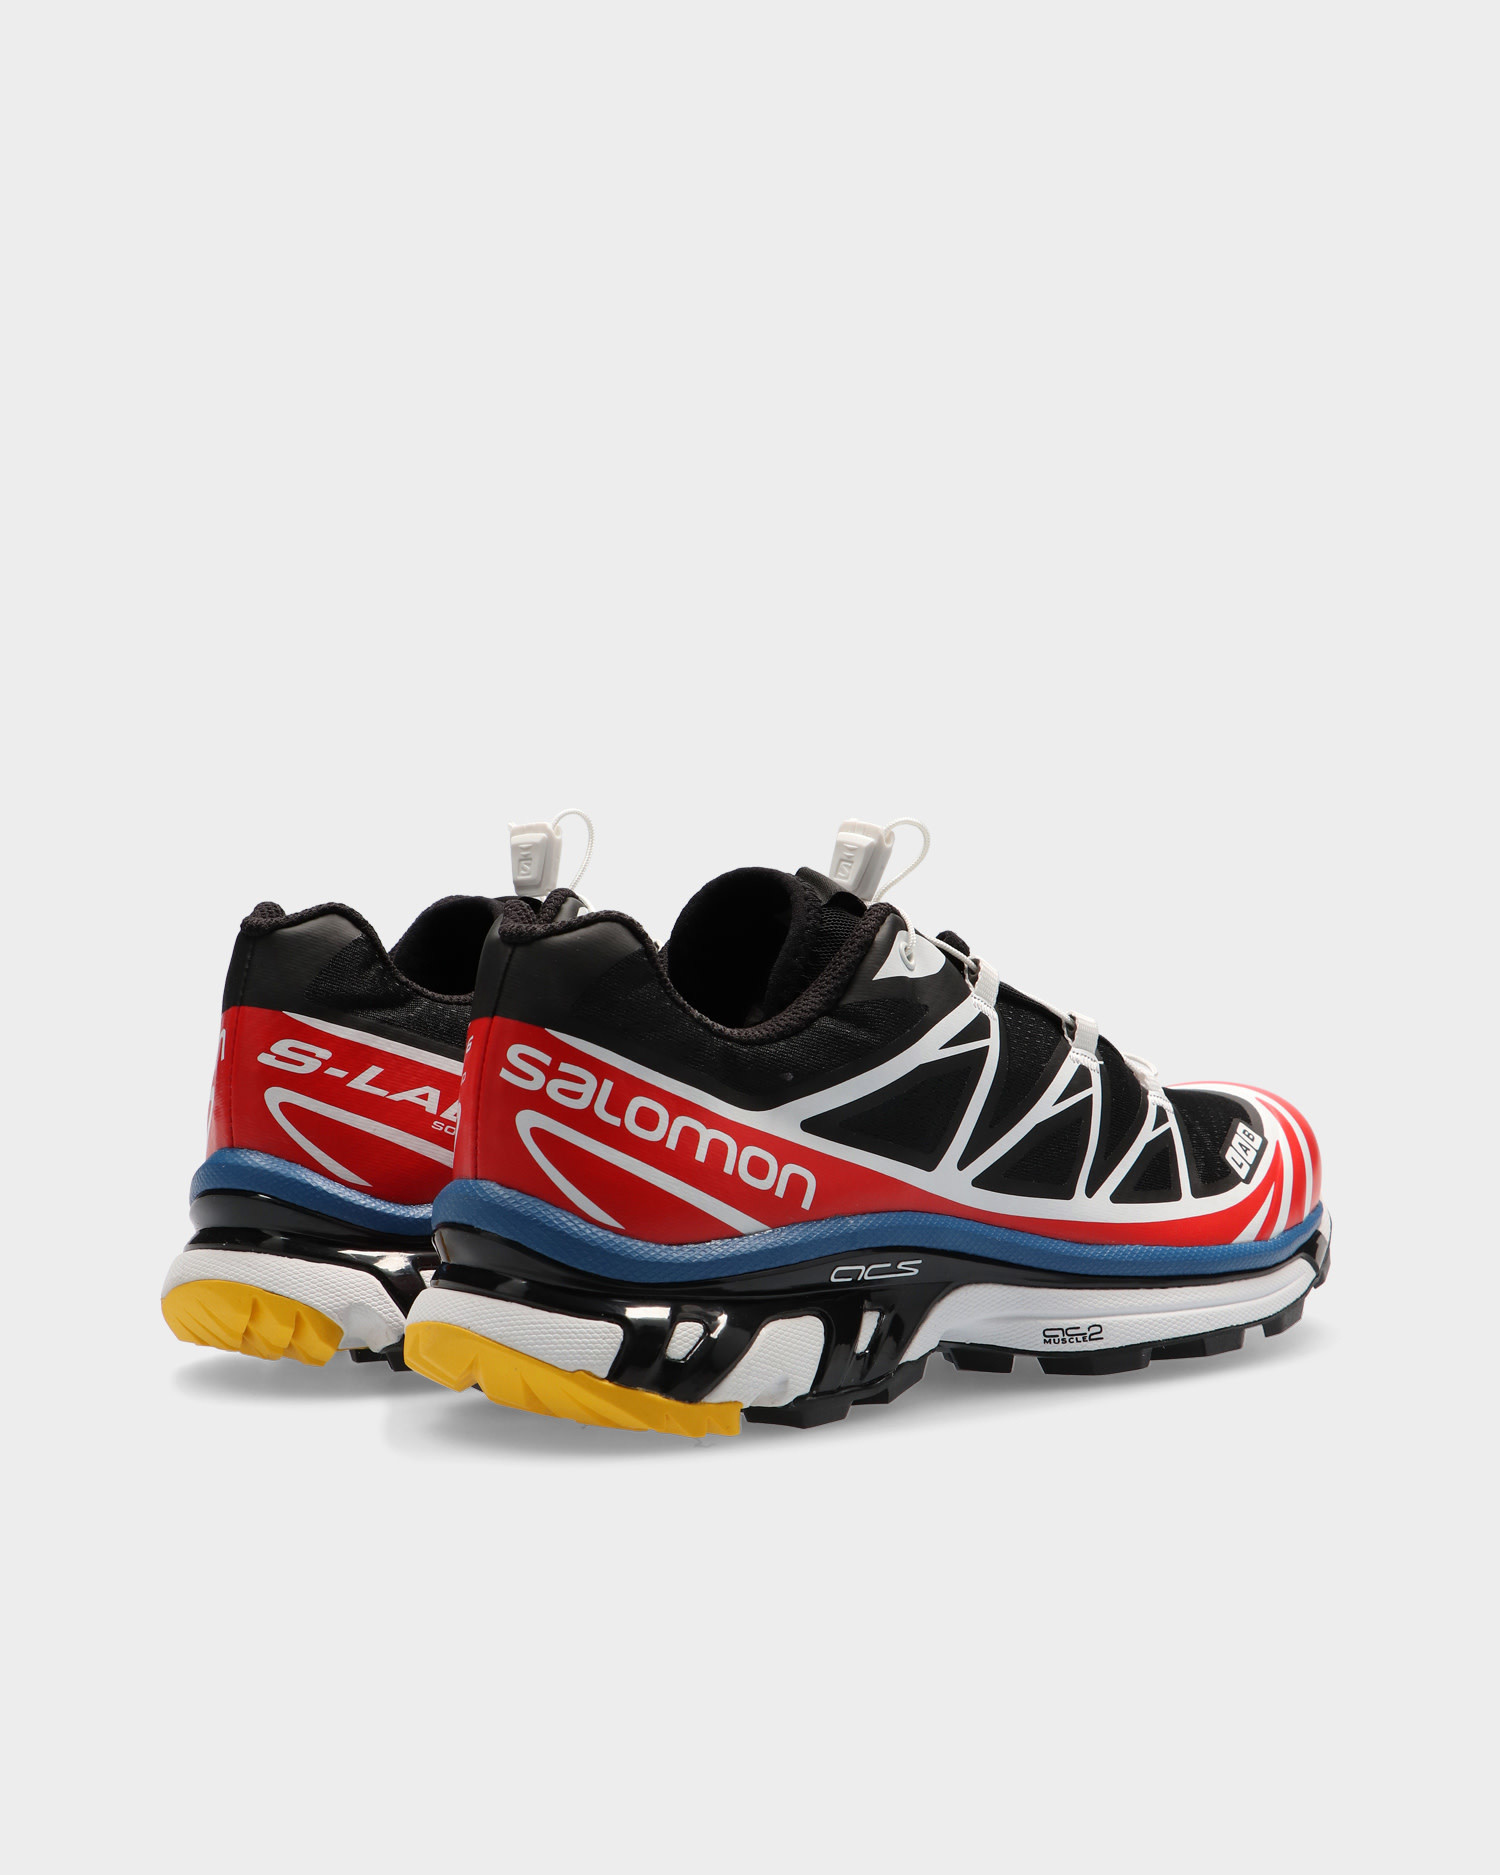 Salomon XT-6 Racing Black/White/Racing Red